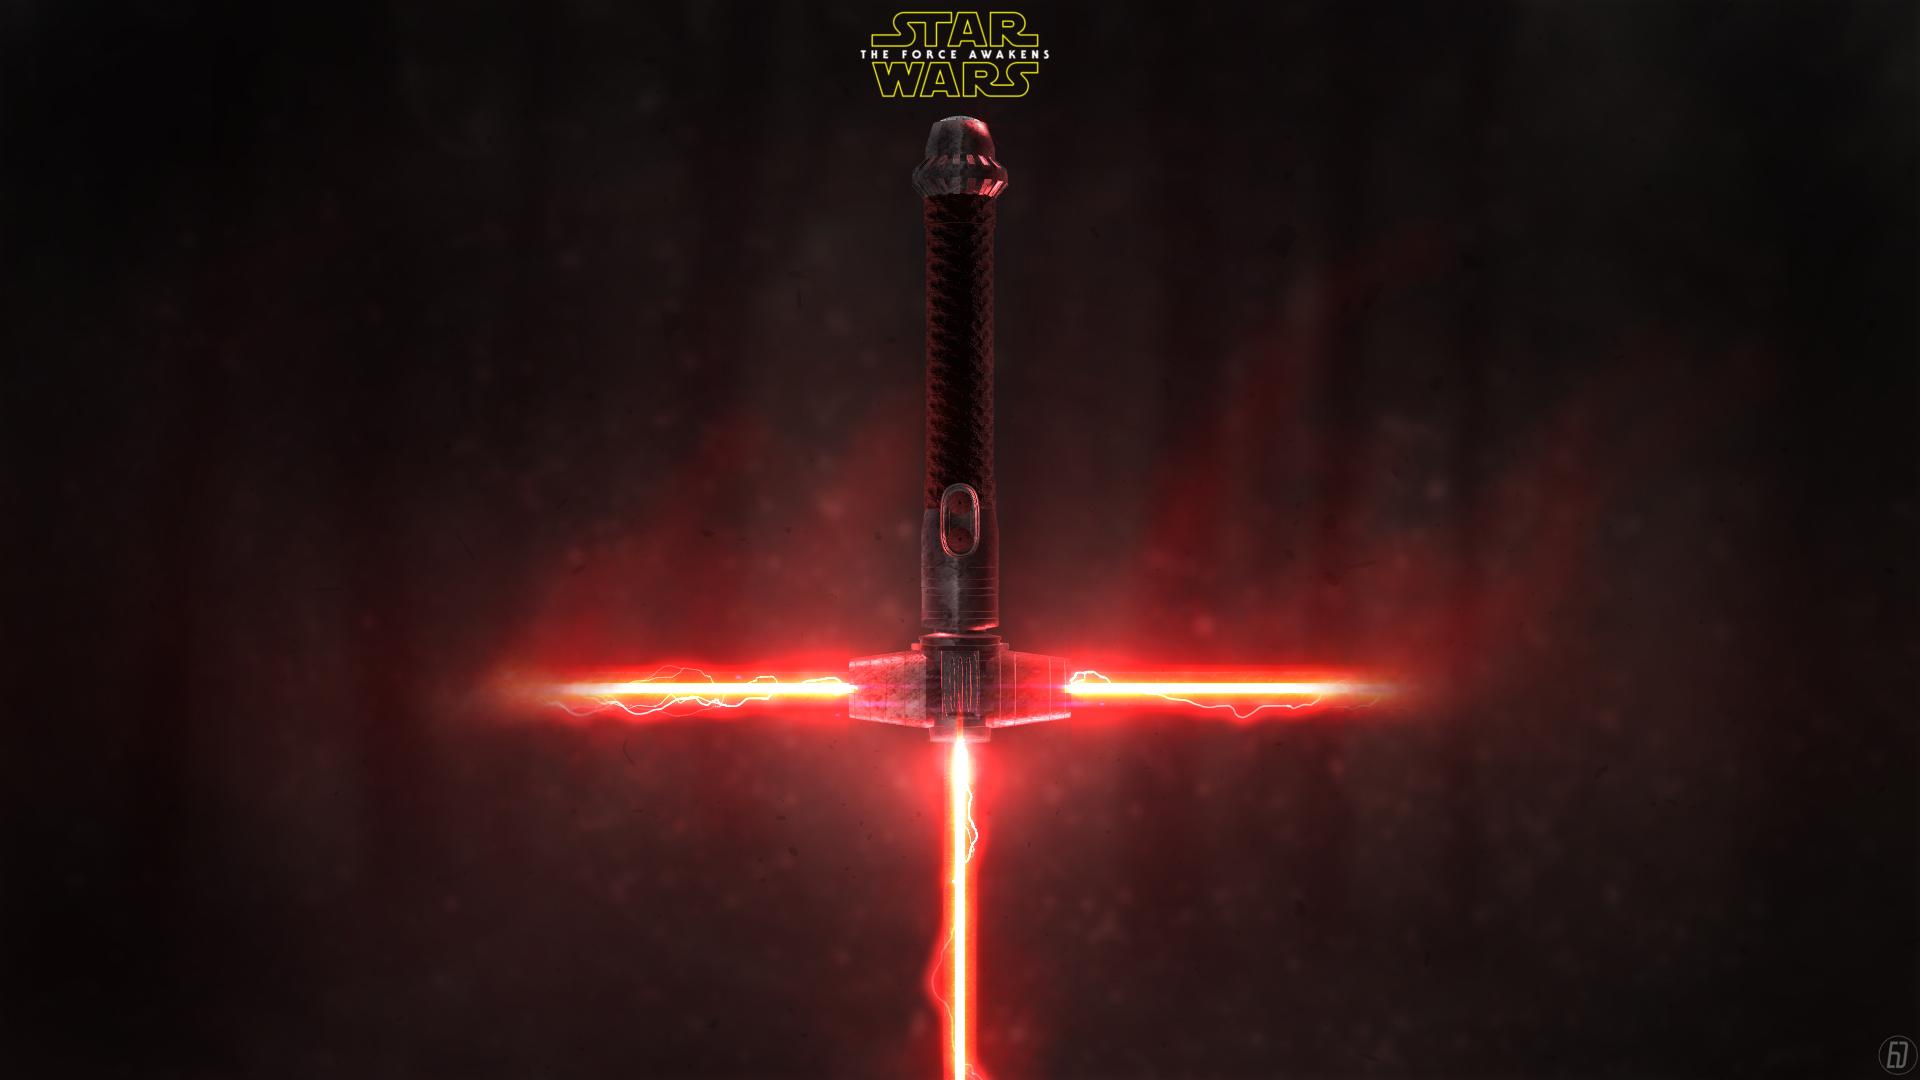 Star Wars Episode VII   The Force Awakens [Wallpapers HD]   Taringa 1920x1080